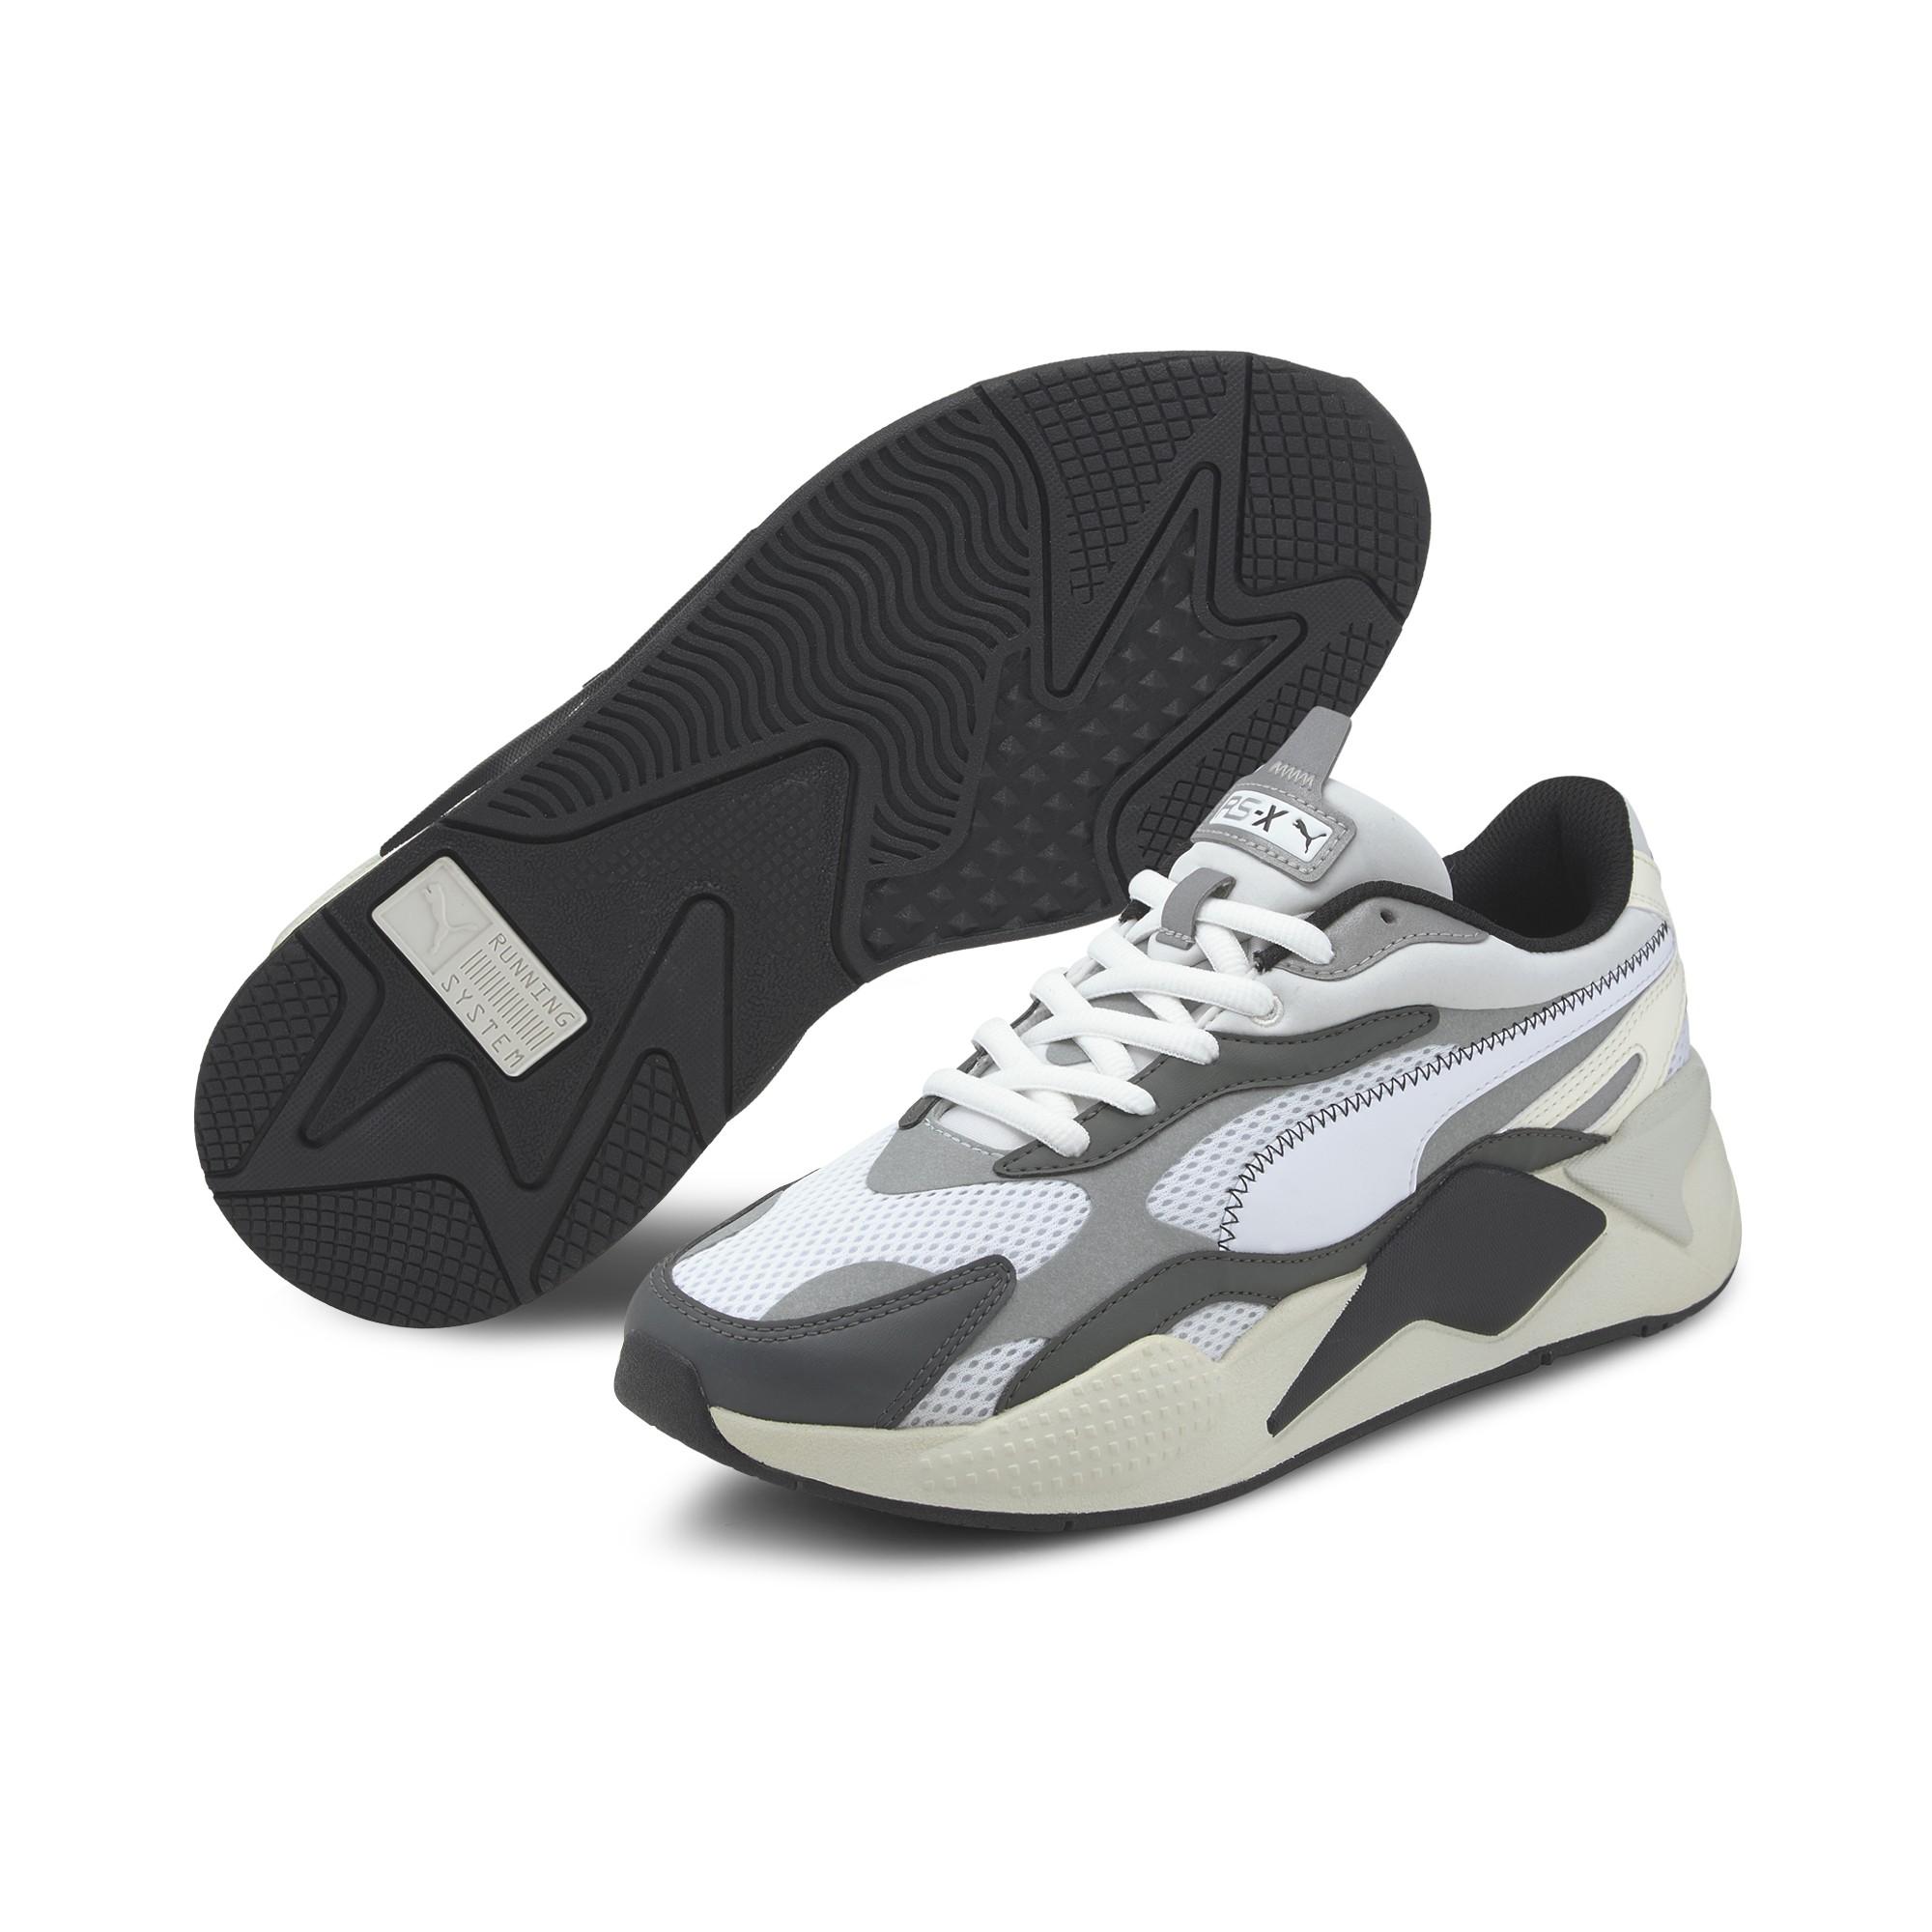 Puma - Fashion Shoe, RS-X3 00 OG - Brands Expert